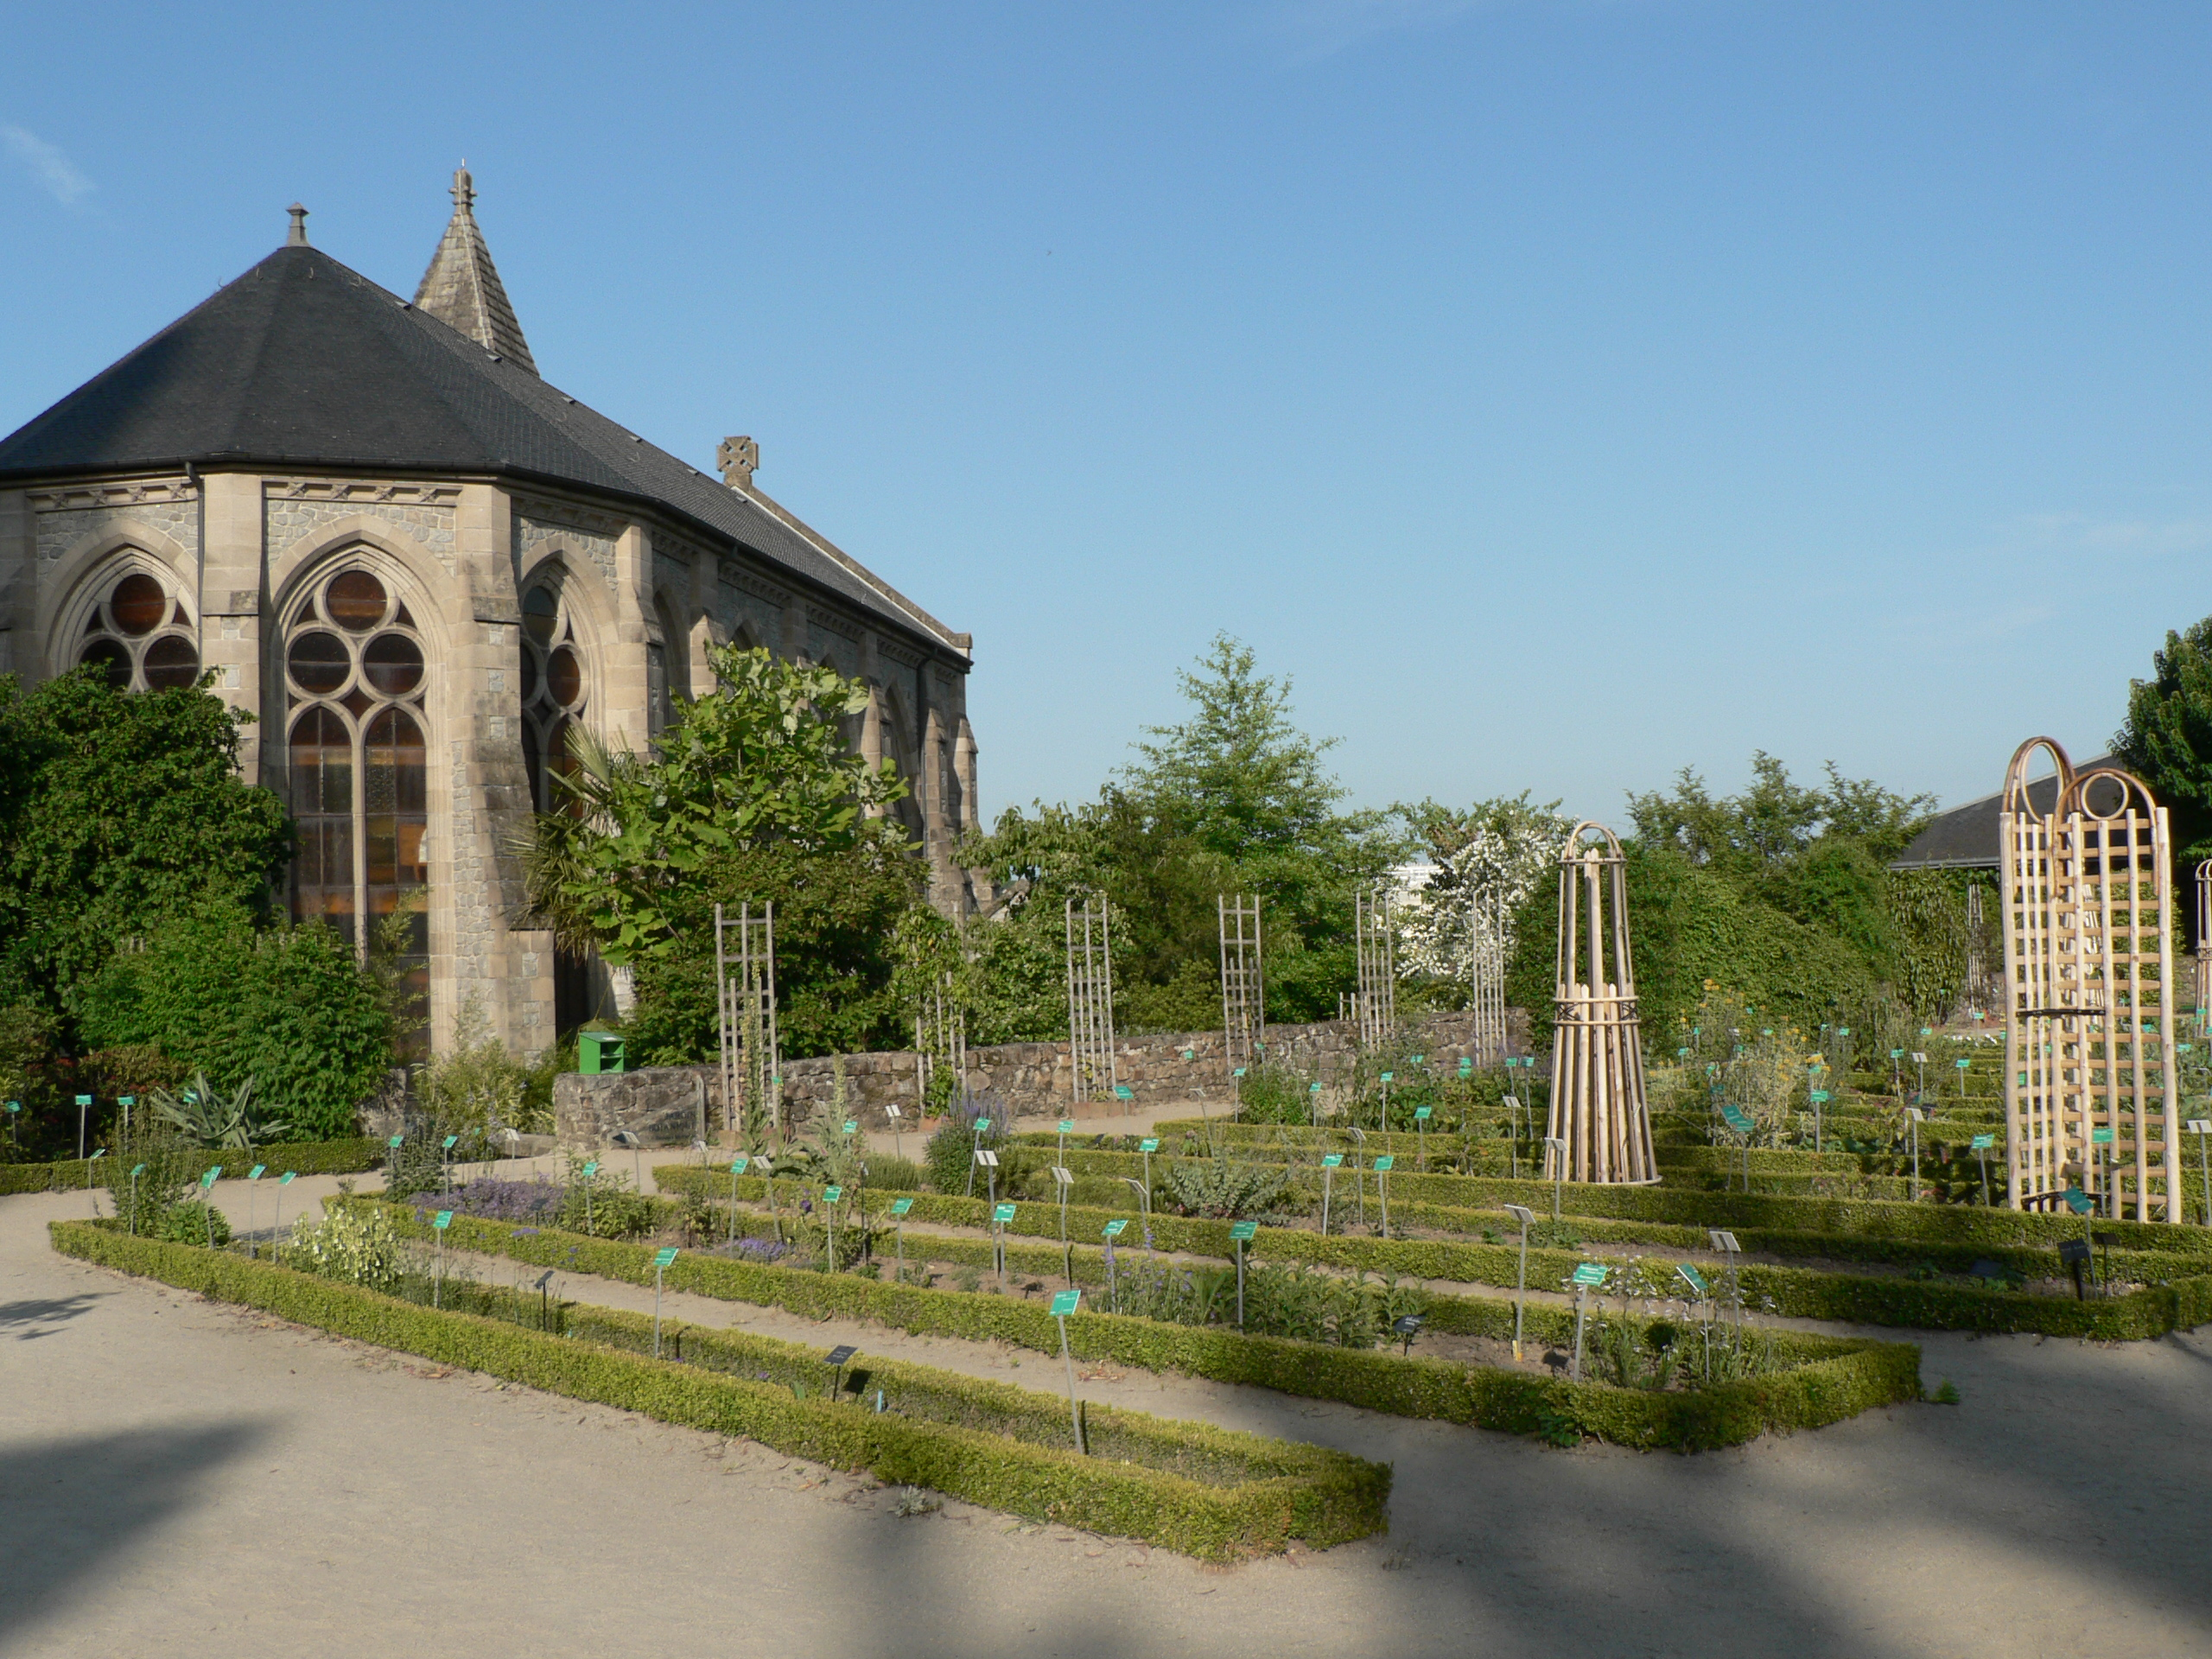 Liste de jardins botaniques en france wikiwand for Jardin de france